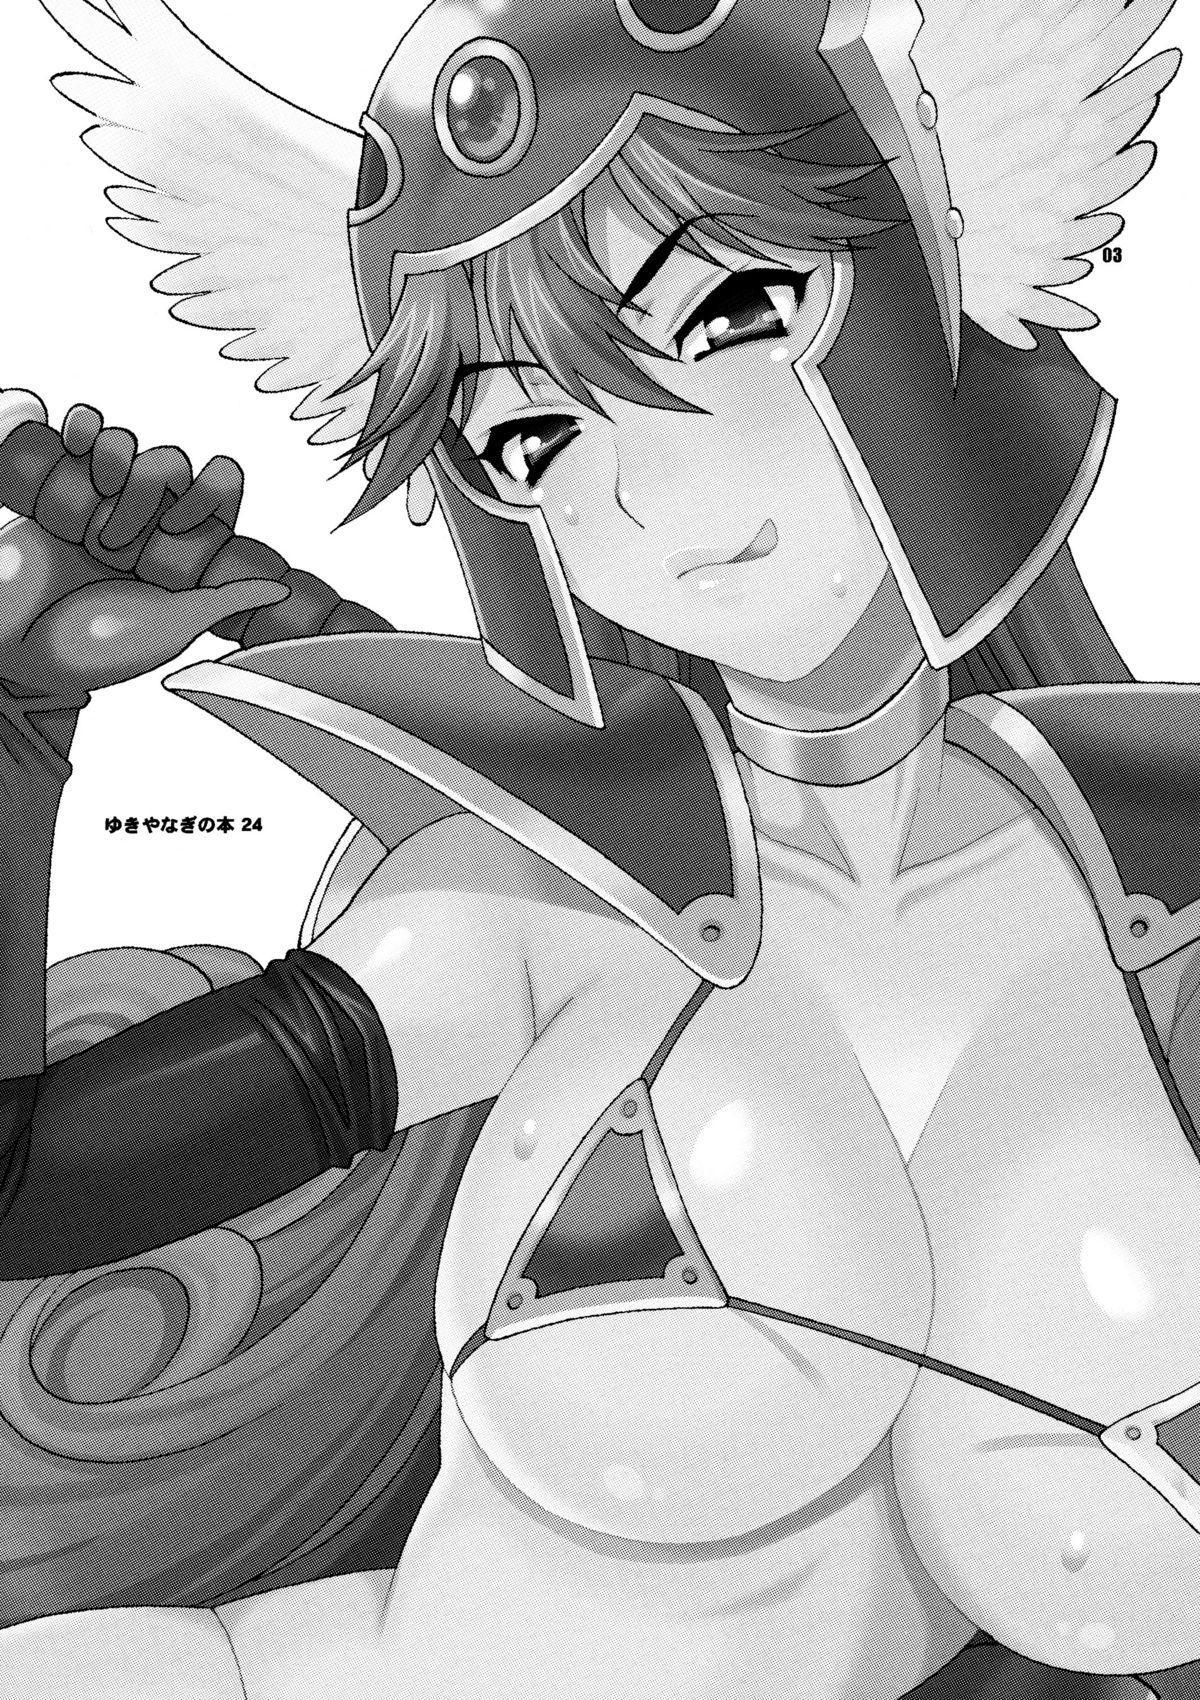 Onna Senshi to Sekai no Unmei | Female Warrior and Fate of the World 1